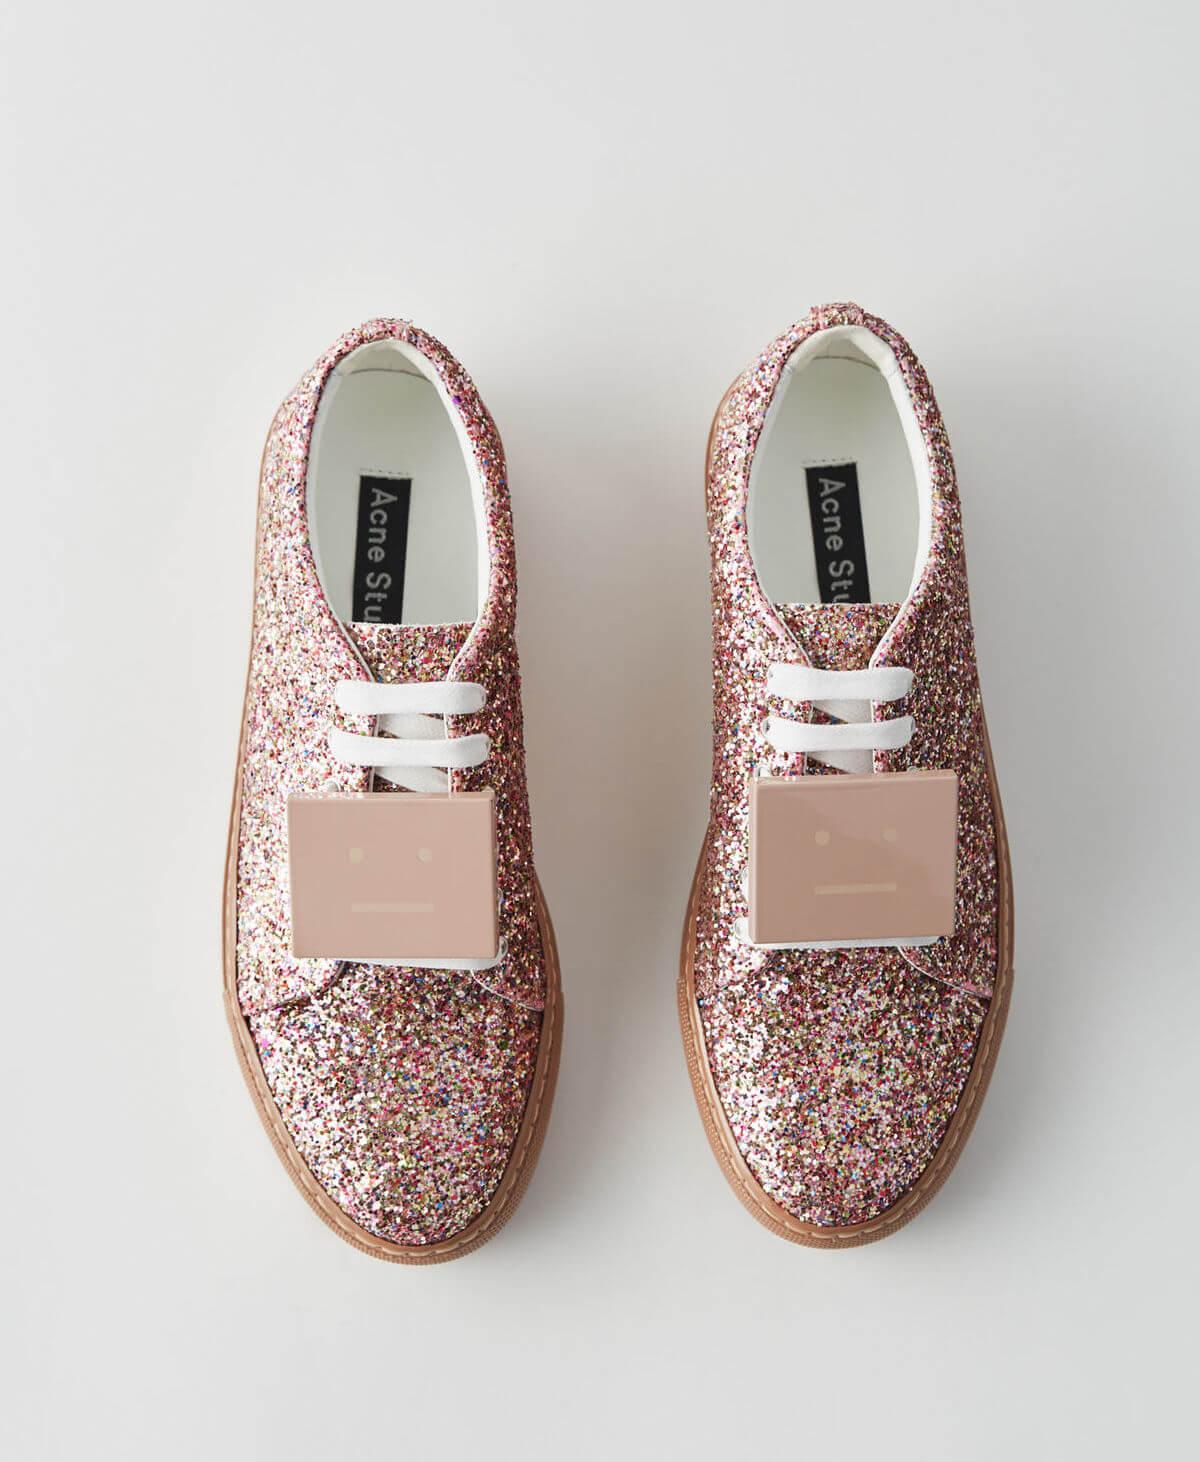 acne sneakers glitter